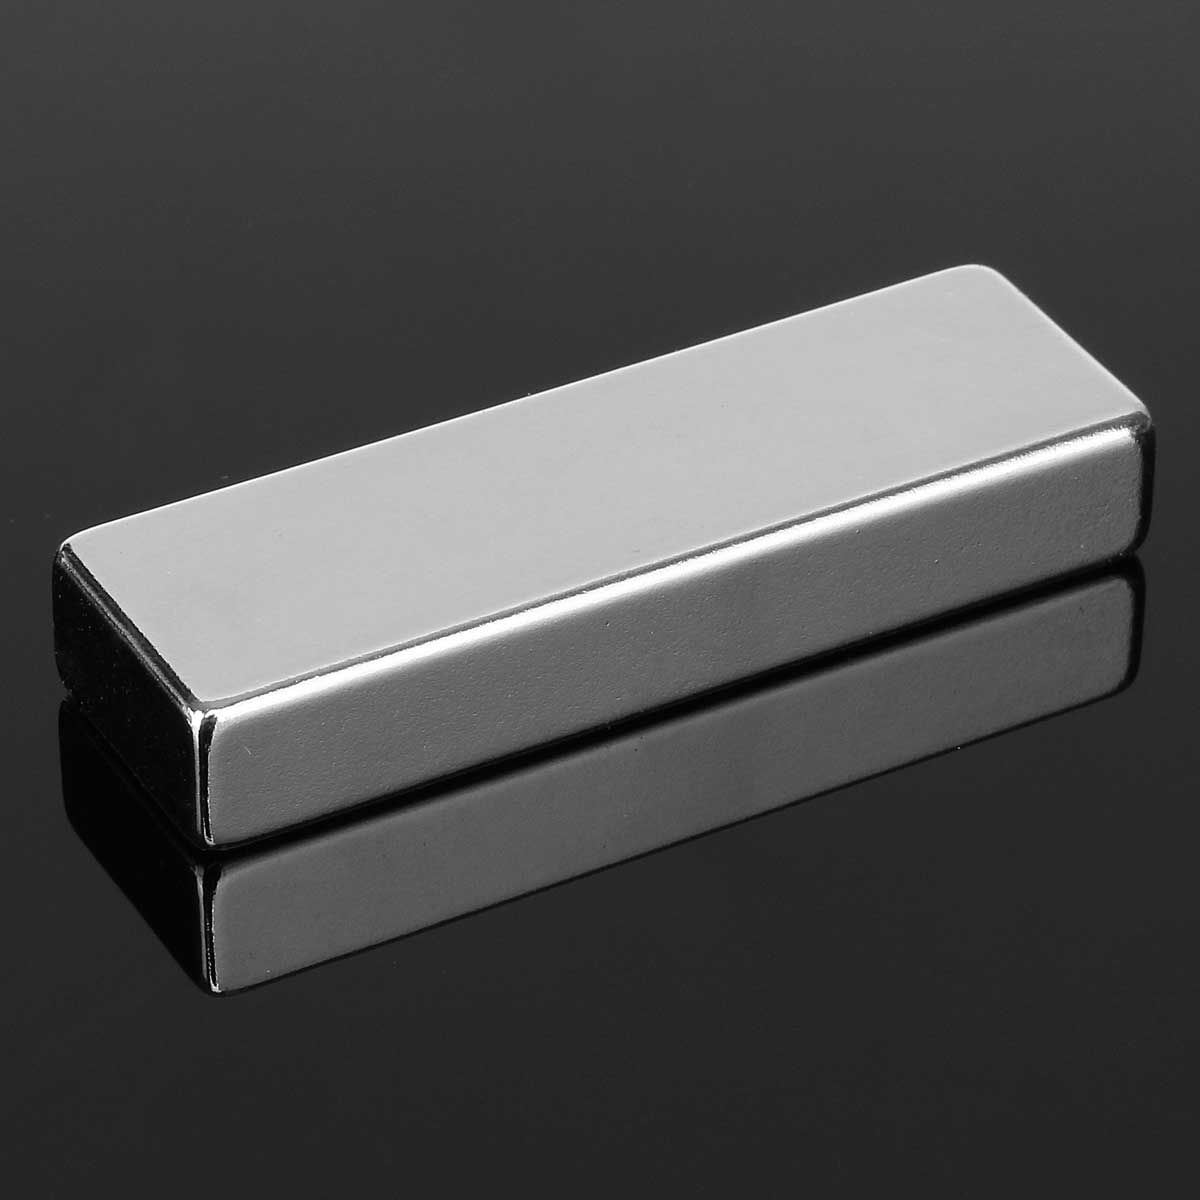 Magnet Neodim DREPTUNGHIULAR D3 mm x L3 mm x H3 mm